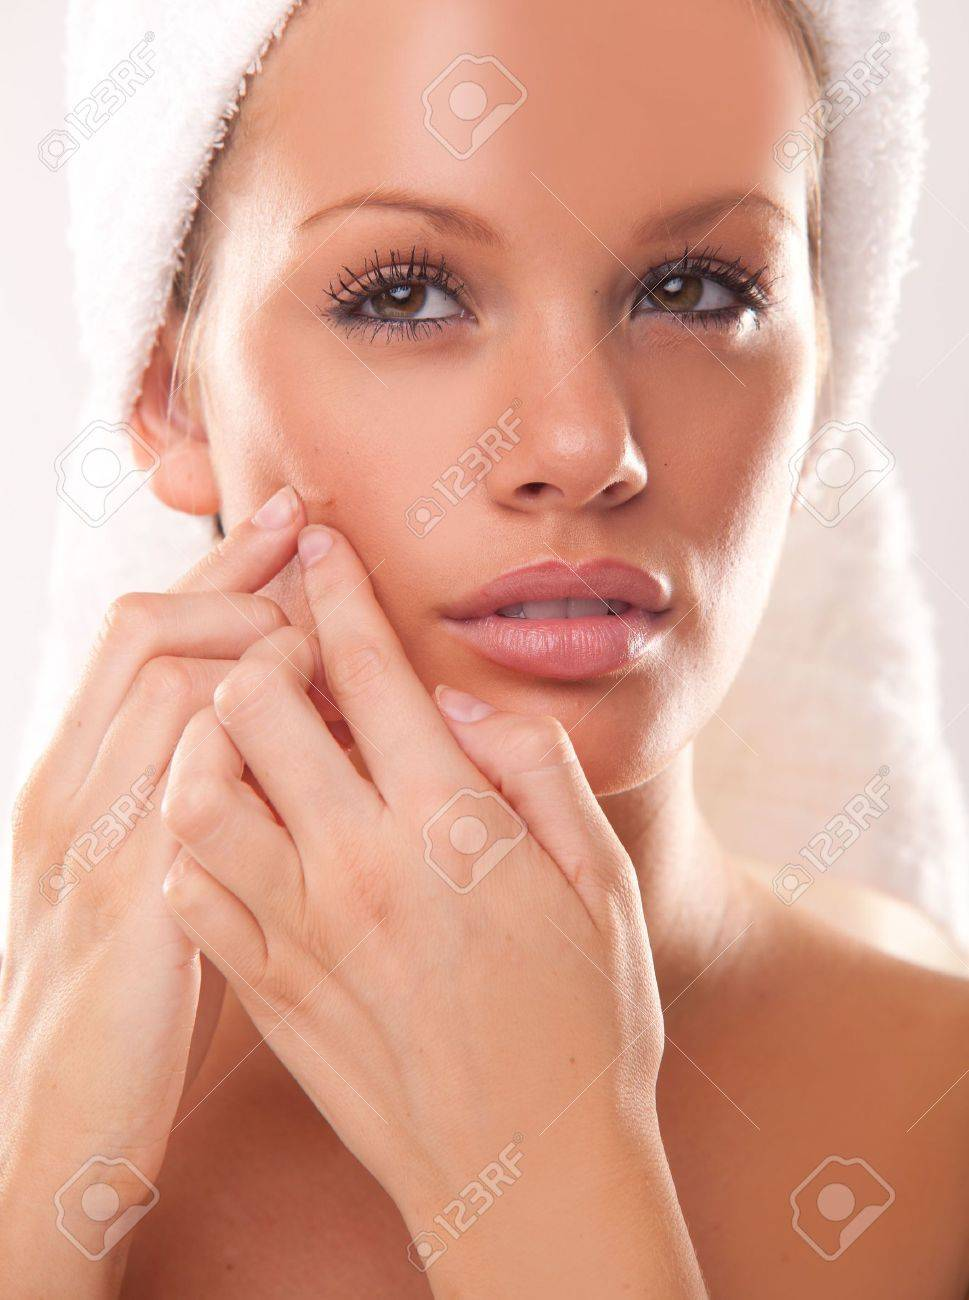 Pimple , spot on beauty woman face Stock Photo - 8015433